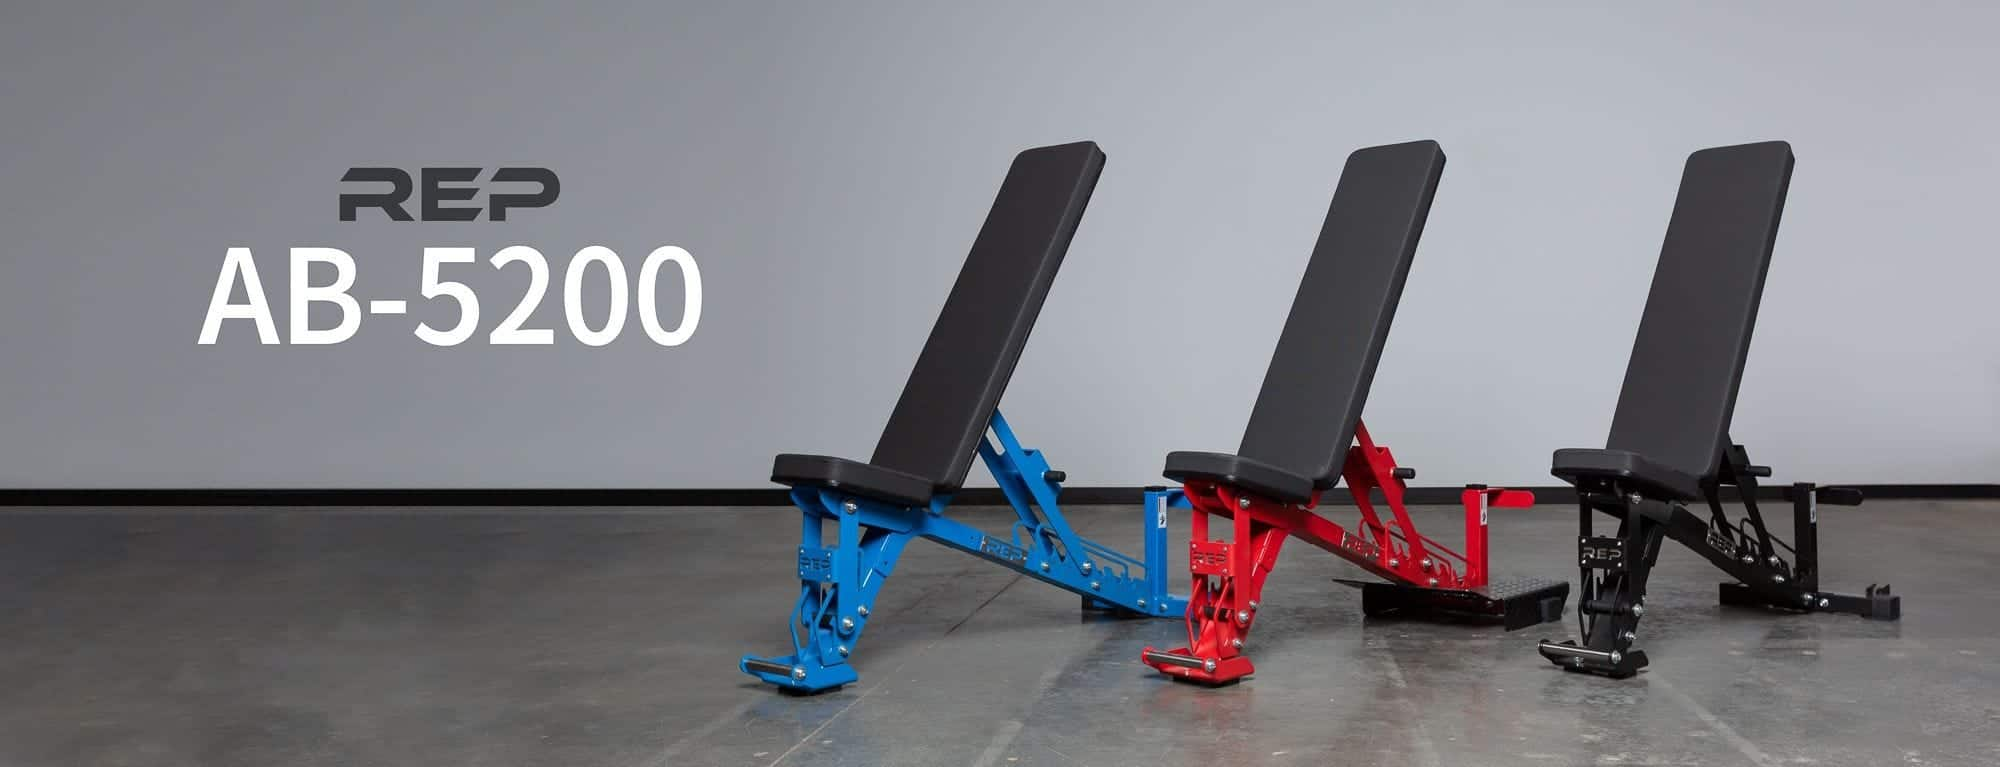 REP AB-5200 ADJUSTABLE BENCH